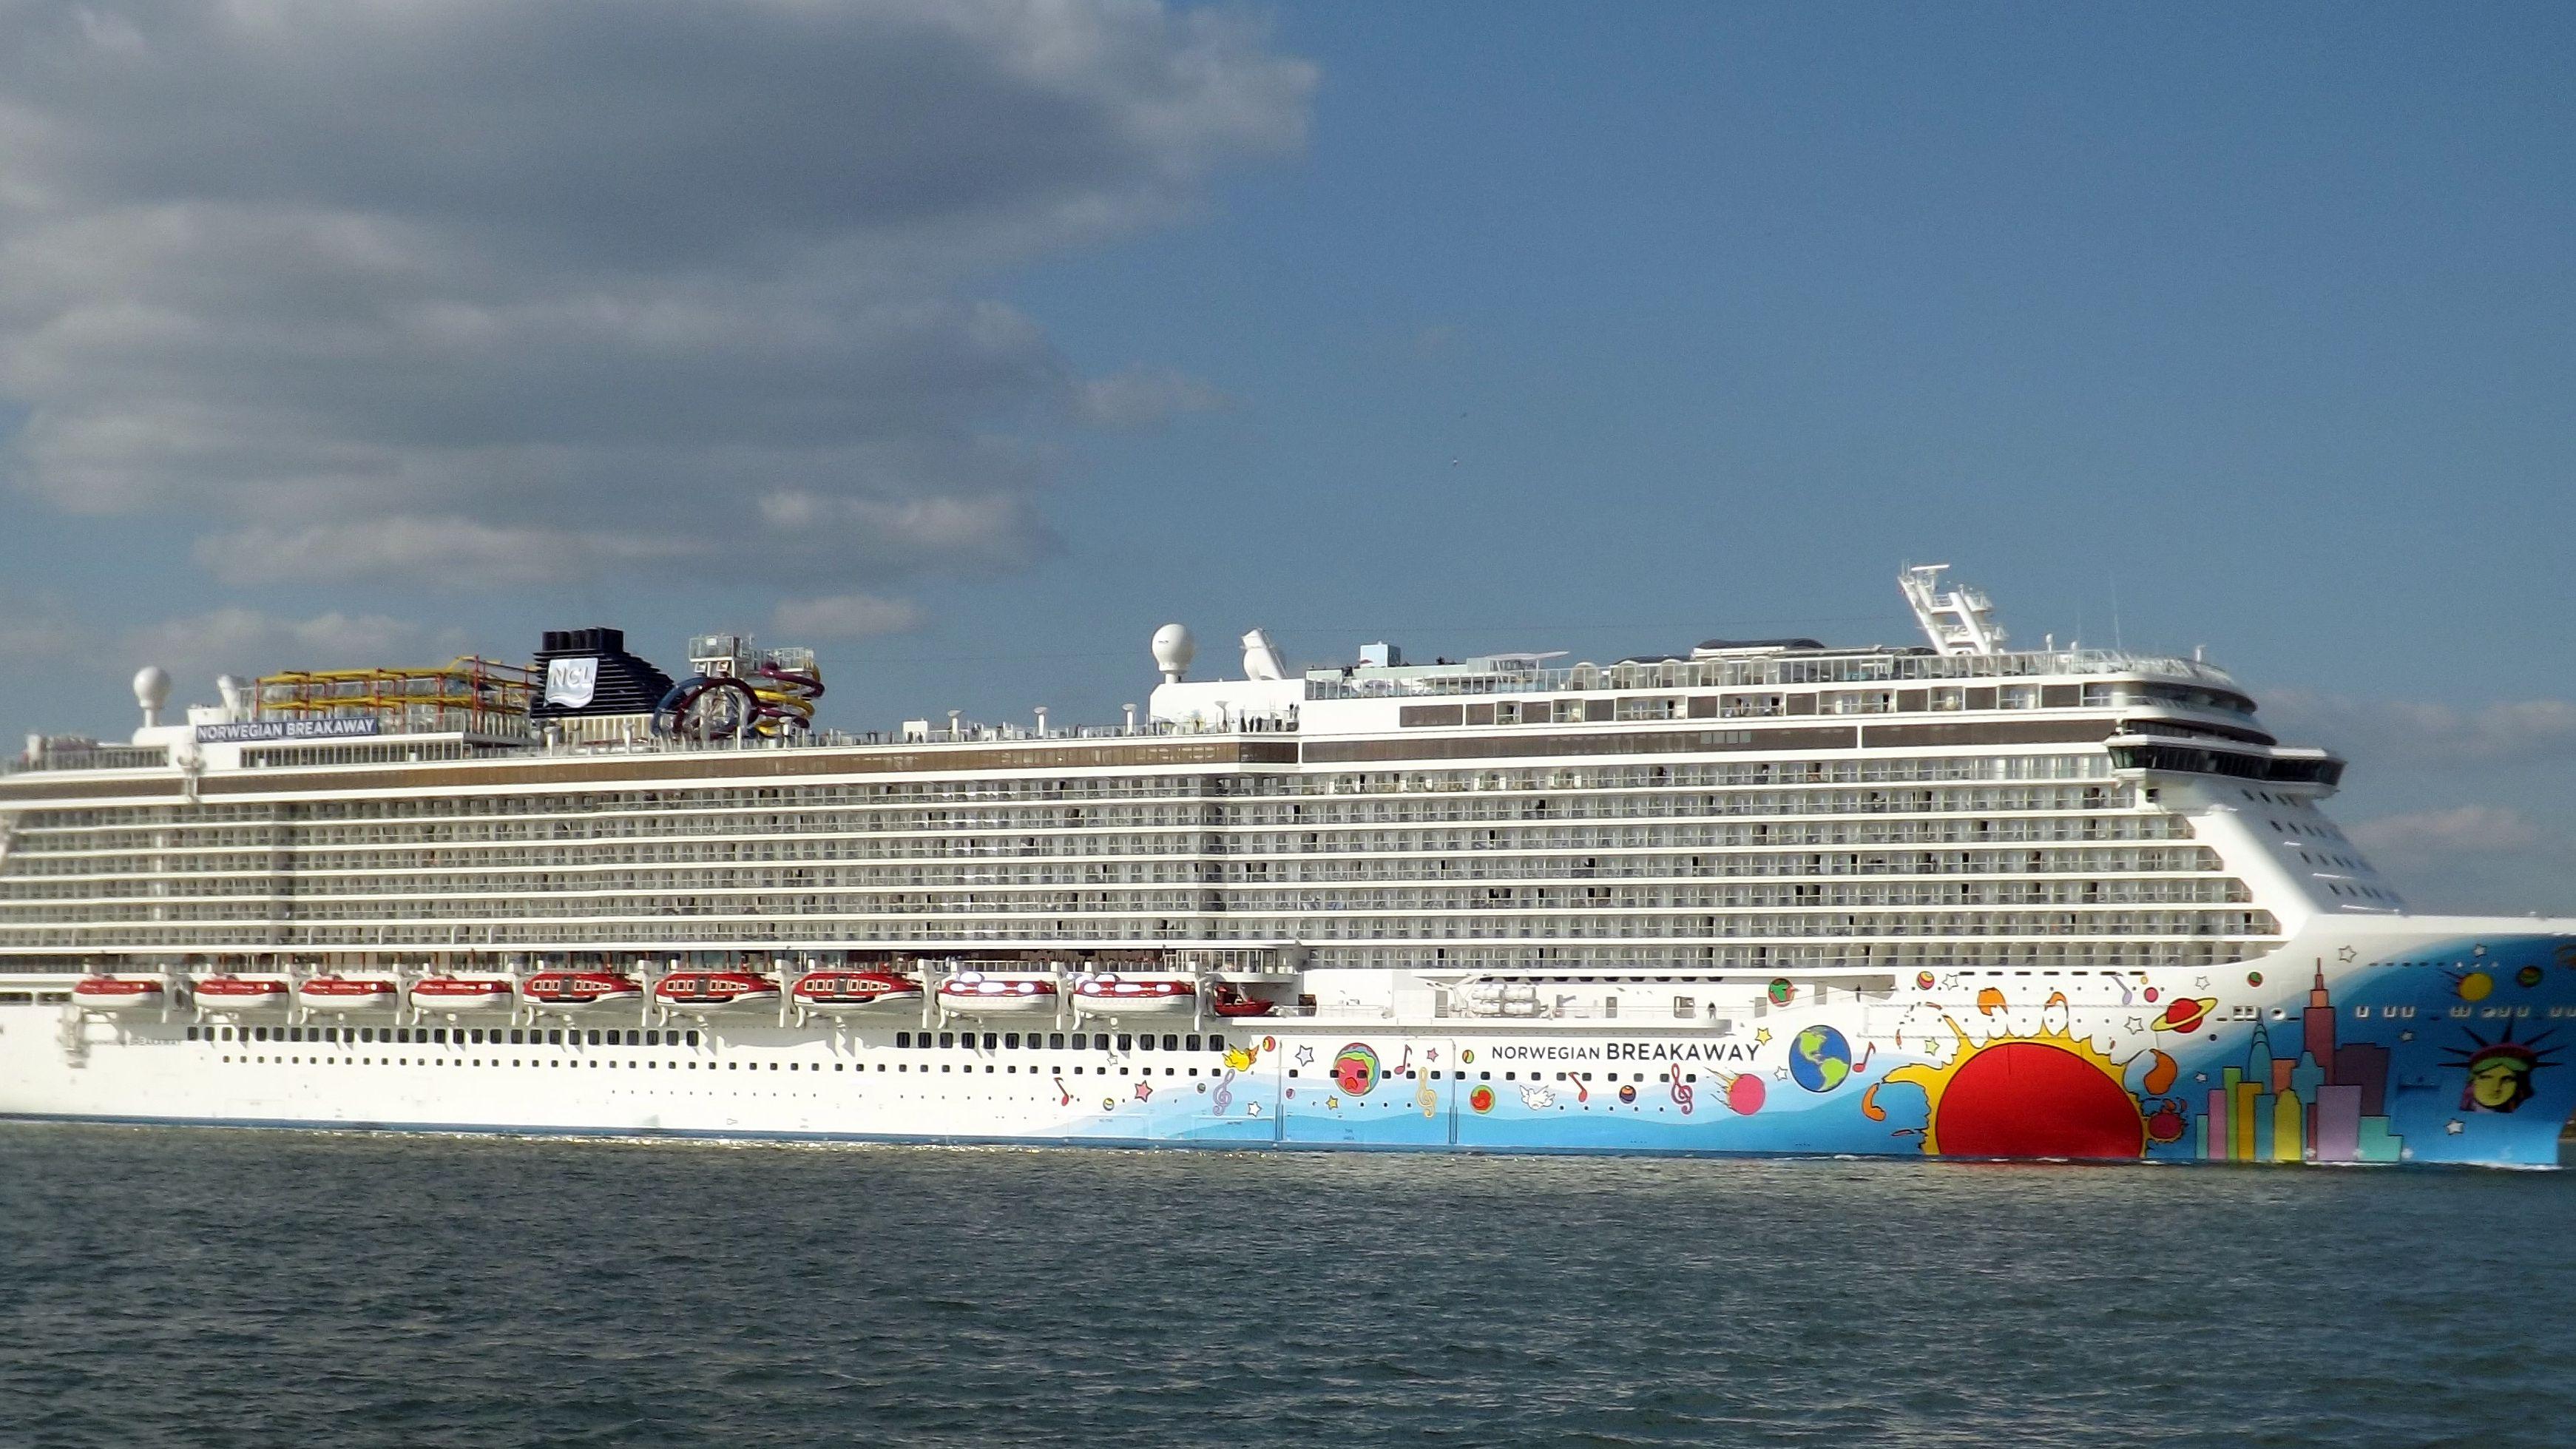 Norwegian Breakaway Cruise Ship Cabins And Suites